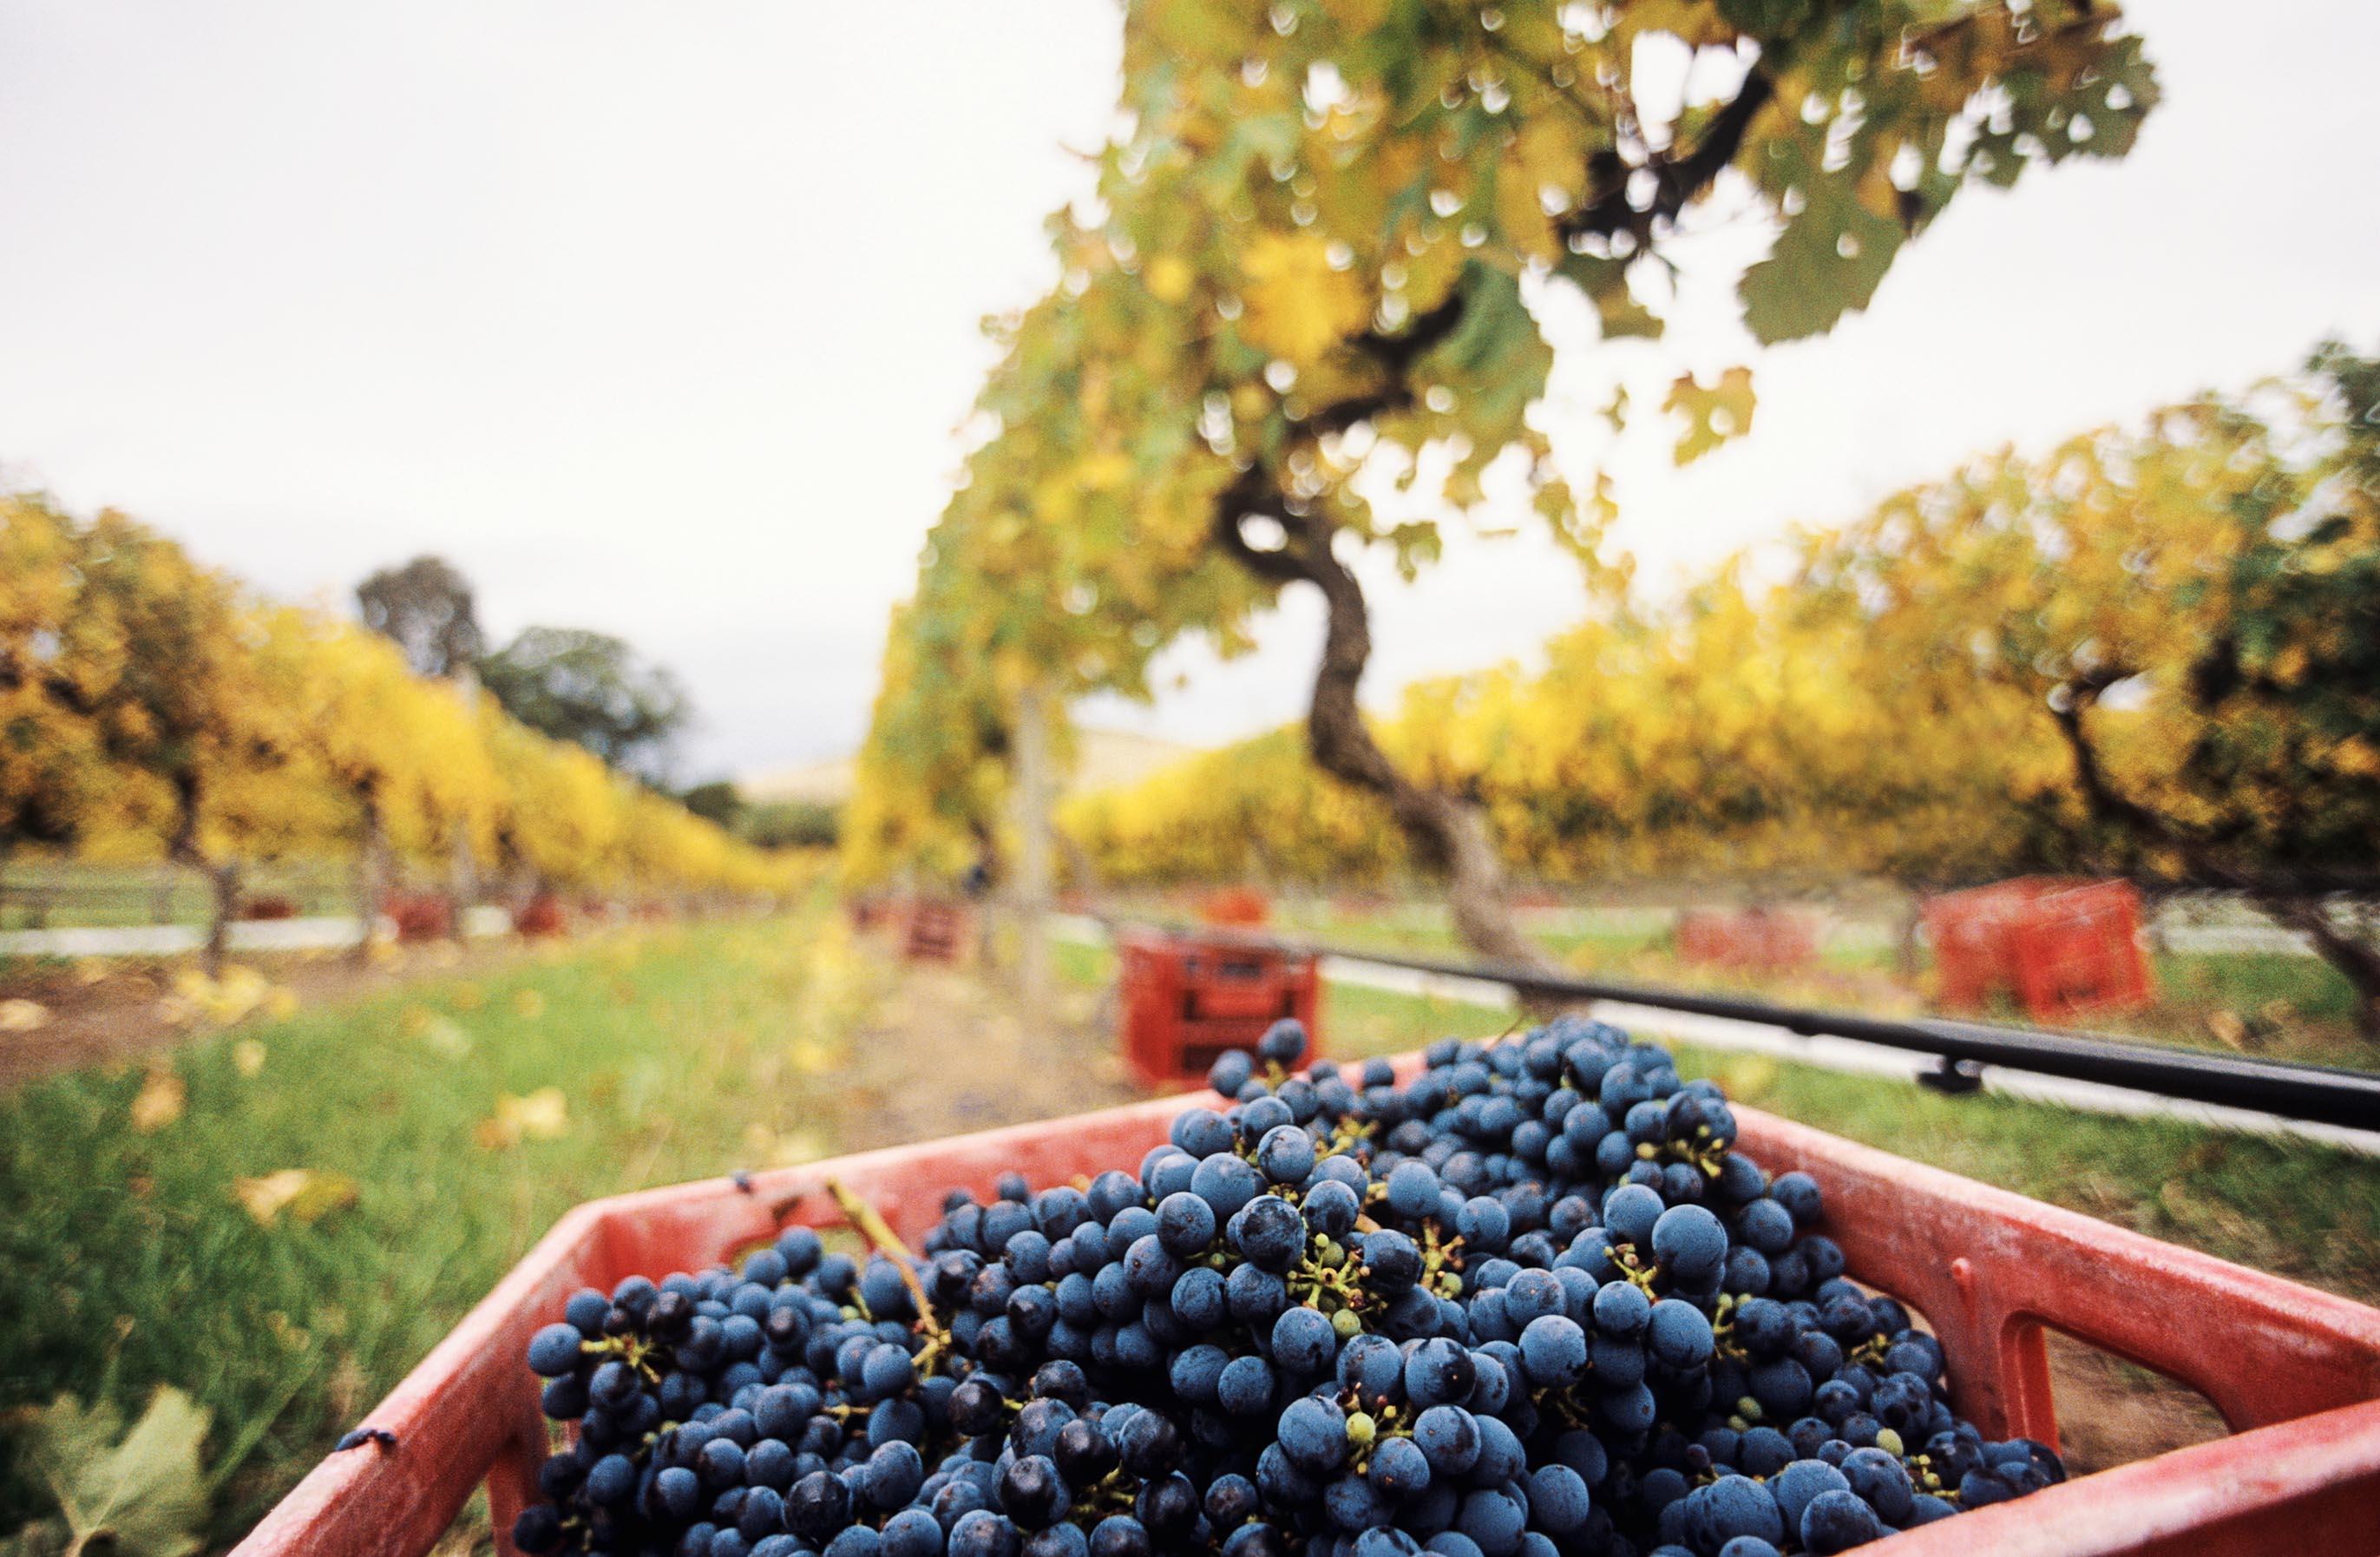 Top 3 wine regions to visit in Australia